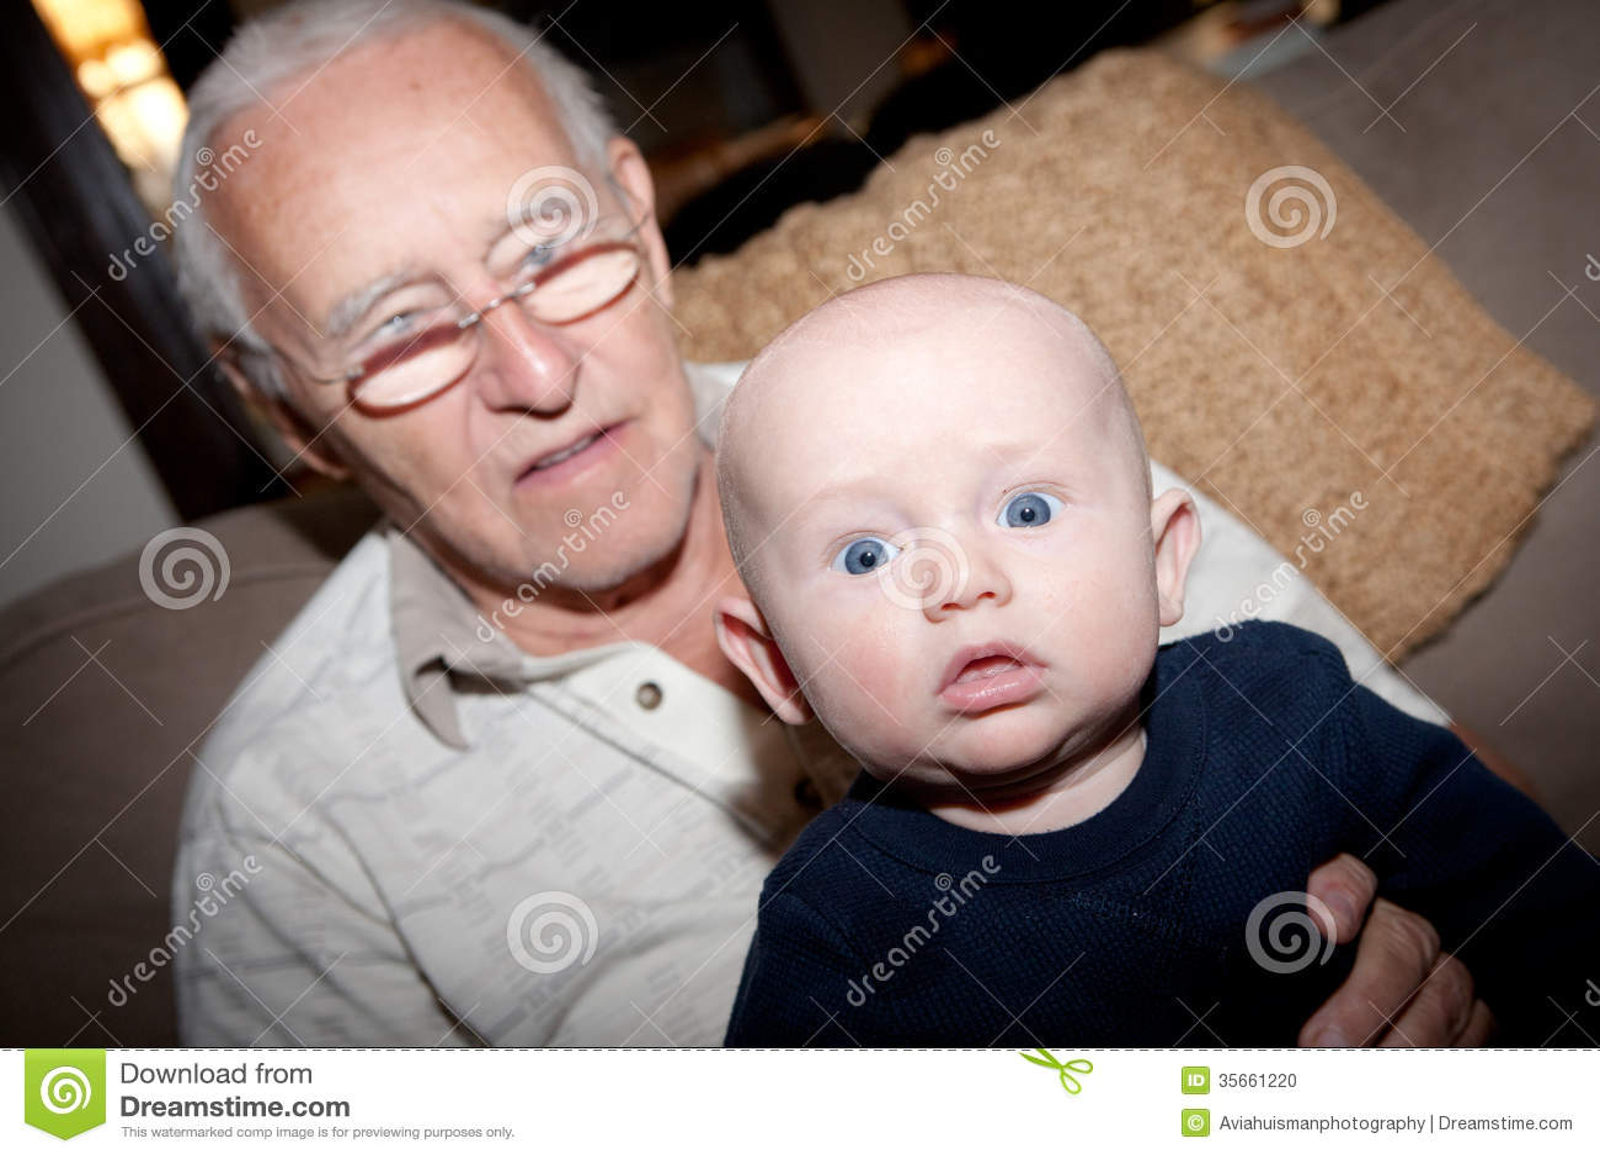 grandfather grandson relationship